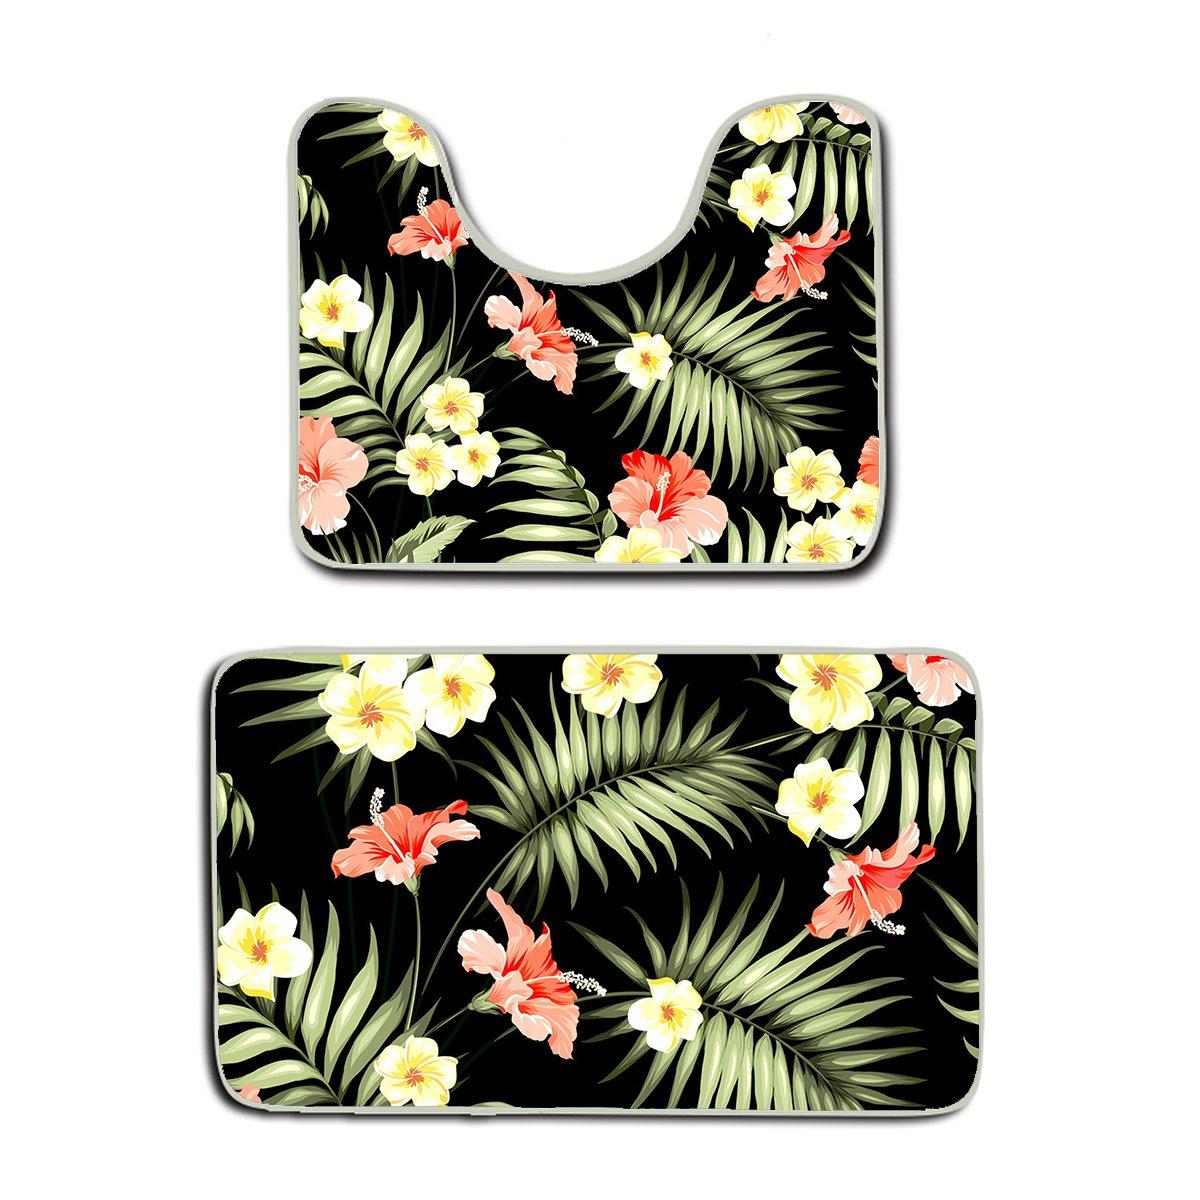 SWEET TANG Memory Foam 2 piece bathroom rug set - Hawaii Hawaiian Tropical Flowers and Jungle Palms - Skidproof bath Mat And Toilet Seat Contour Cover rug